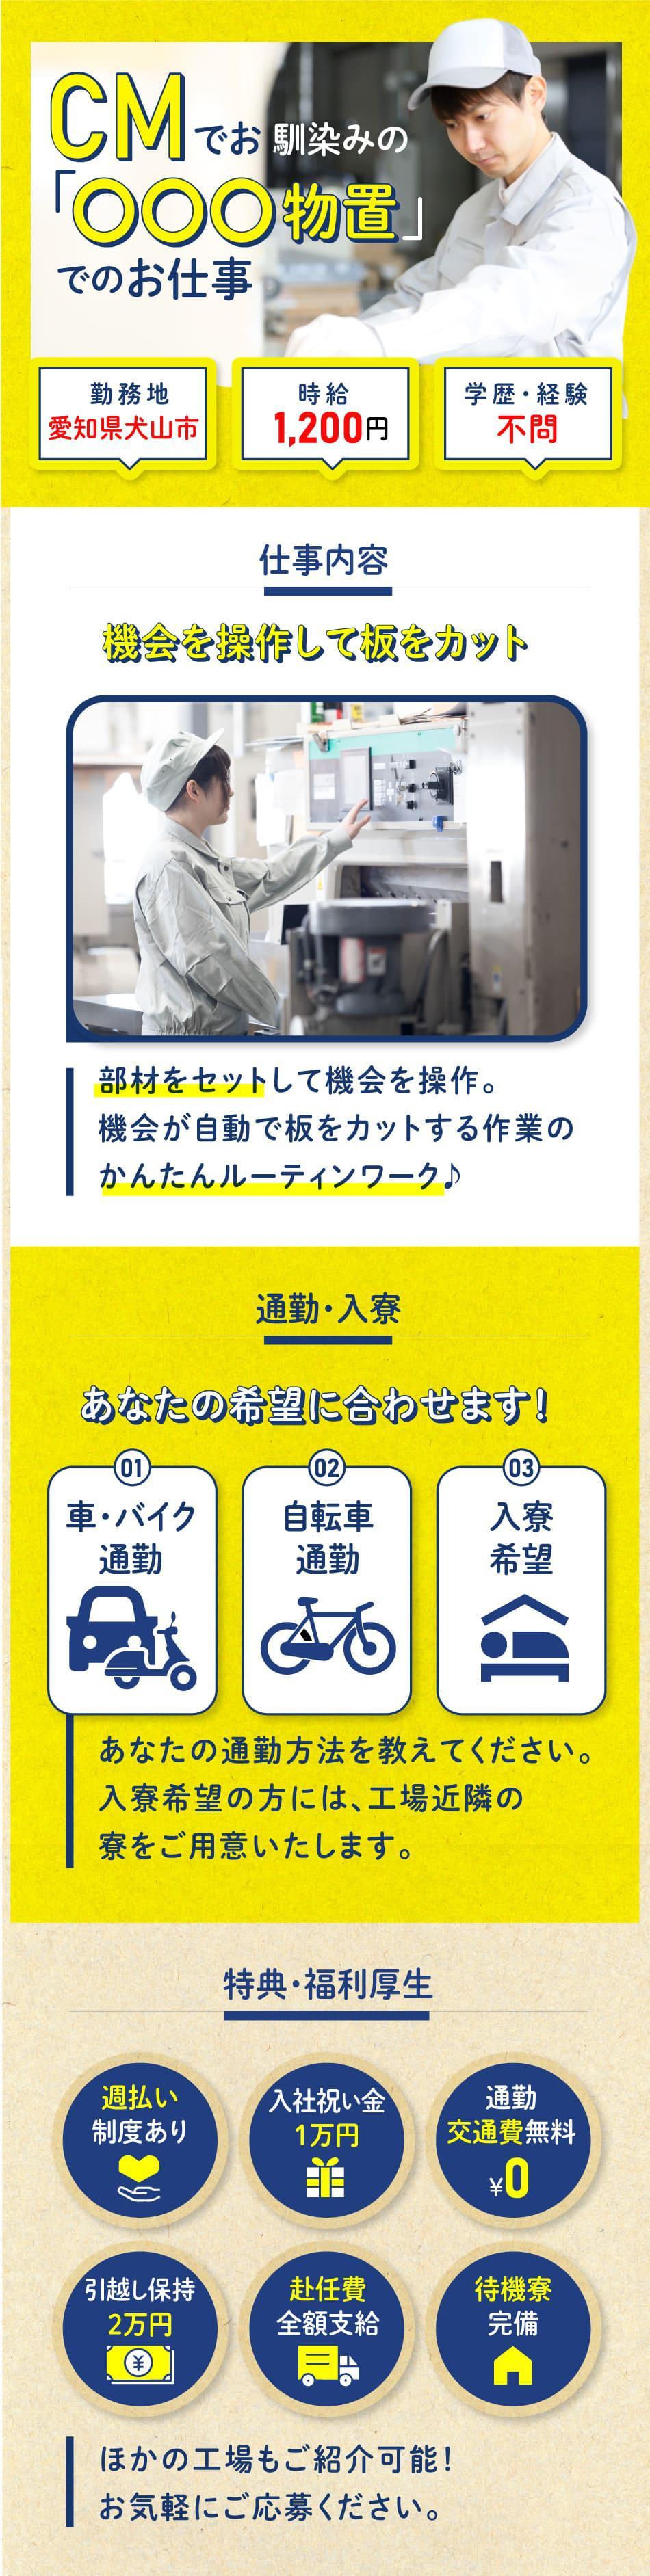 inaba_LP_20200429A.jpg